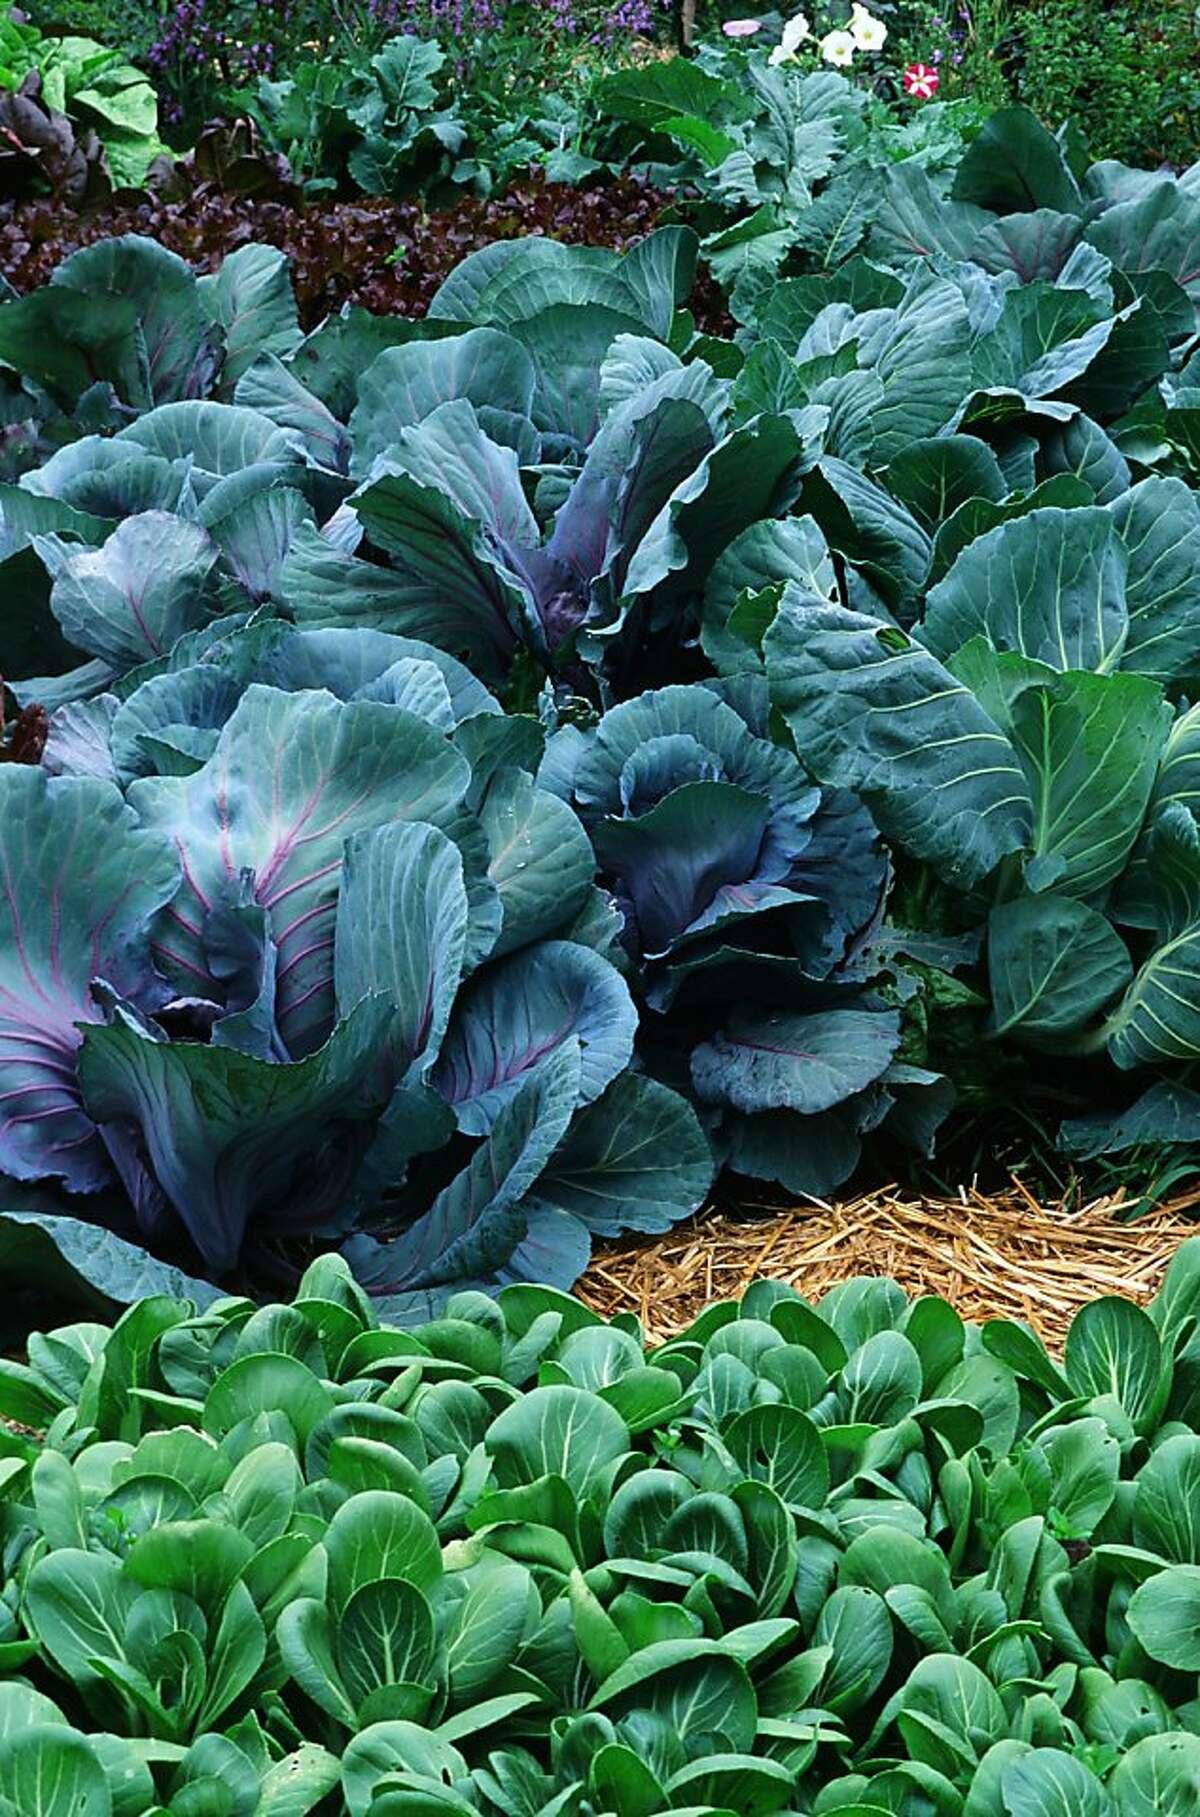 Purple cabbage and bok choy growing heartily into autumn in a San Francisco garden.